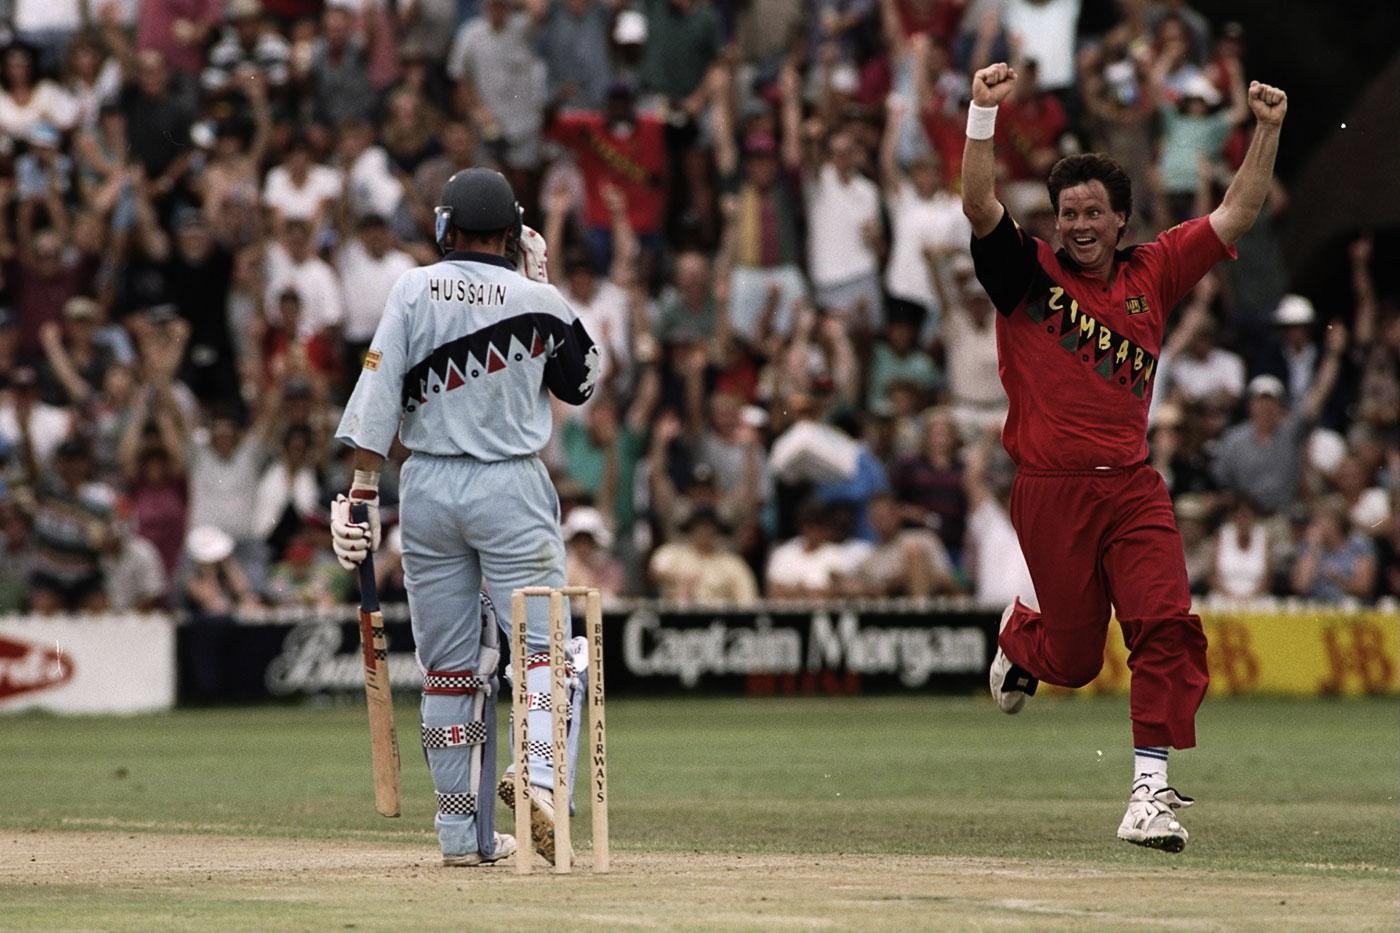 Brandes celebrates his hat-trick wicket - Nasser Hussain - in Harare, 1997